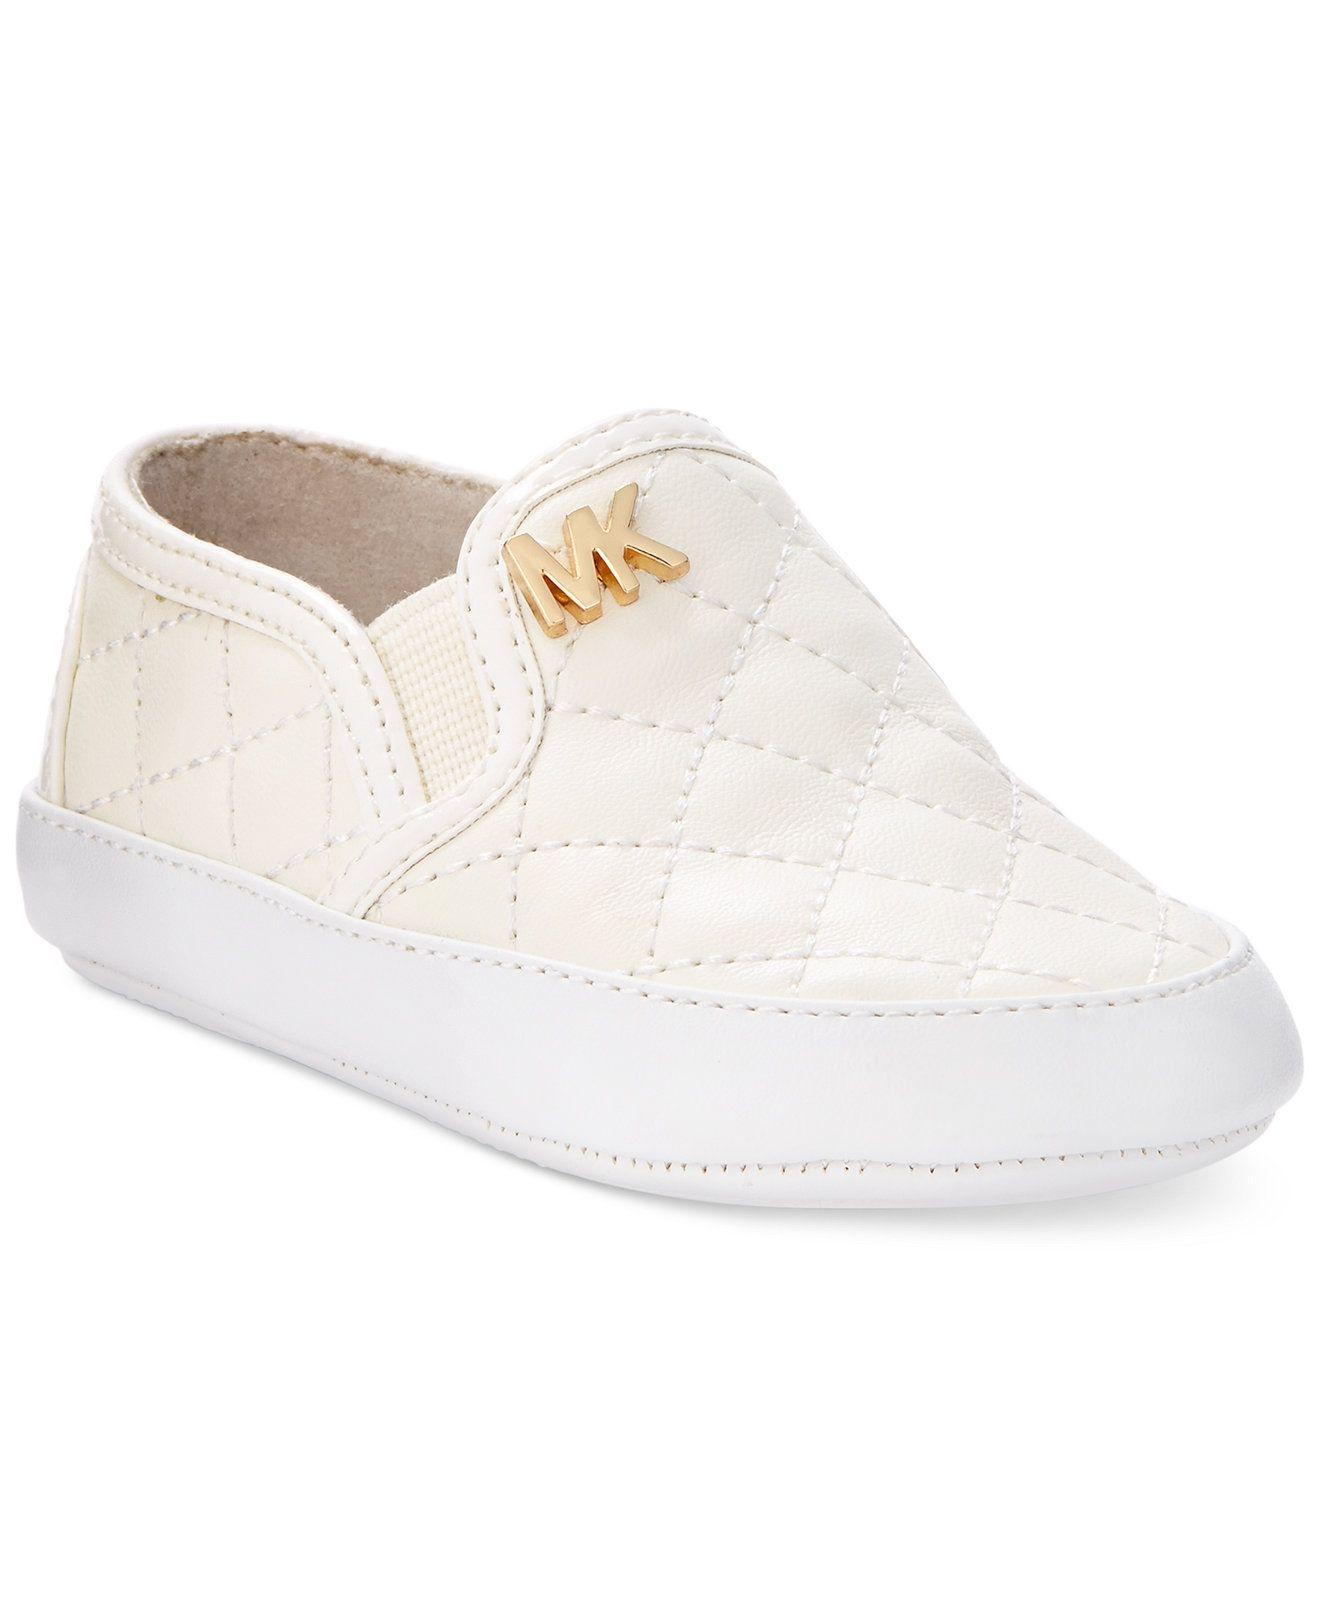 Newborn Baby Girl Coach Shoes